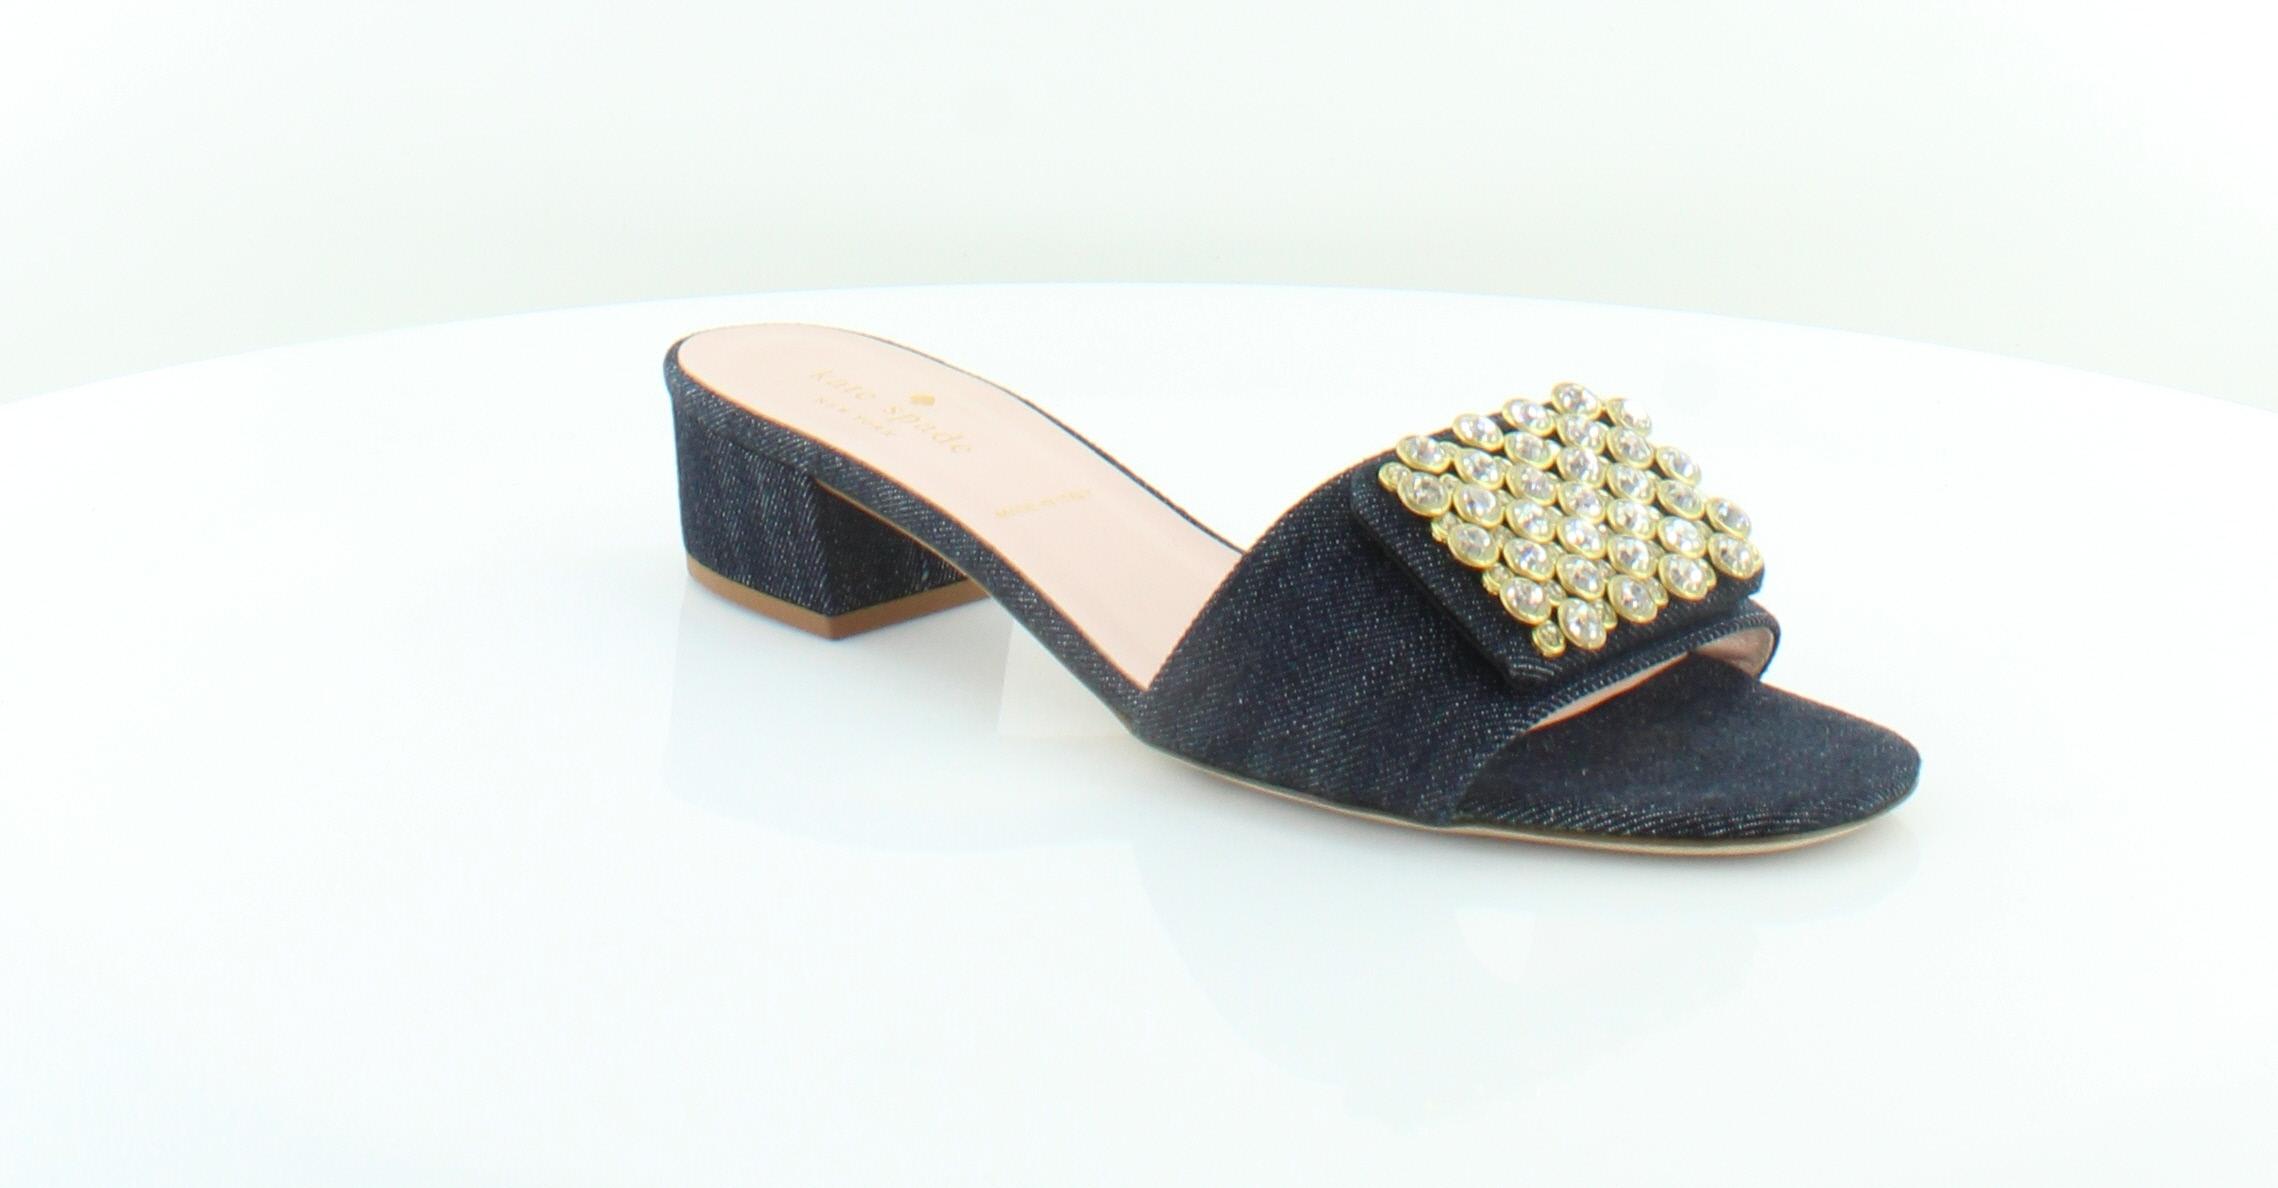 cff8a7a1c254c Kate Spade Mazie Blue Womens Shoes Size 8 M Sandals MSRP $328 ...